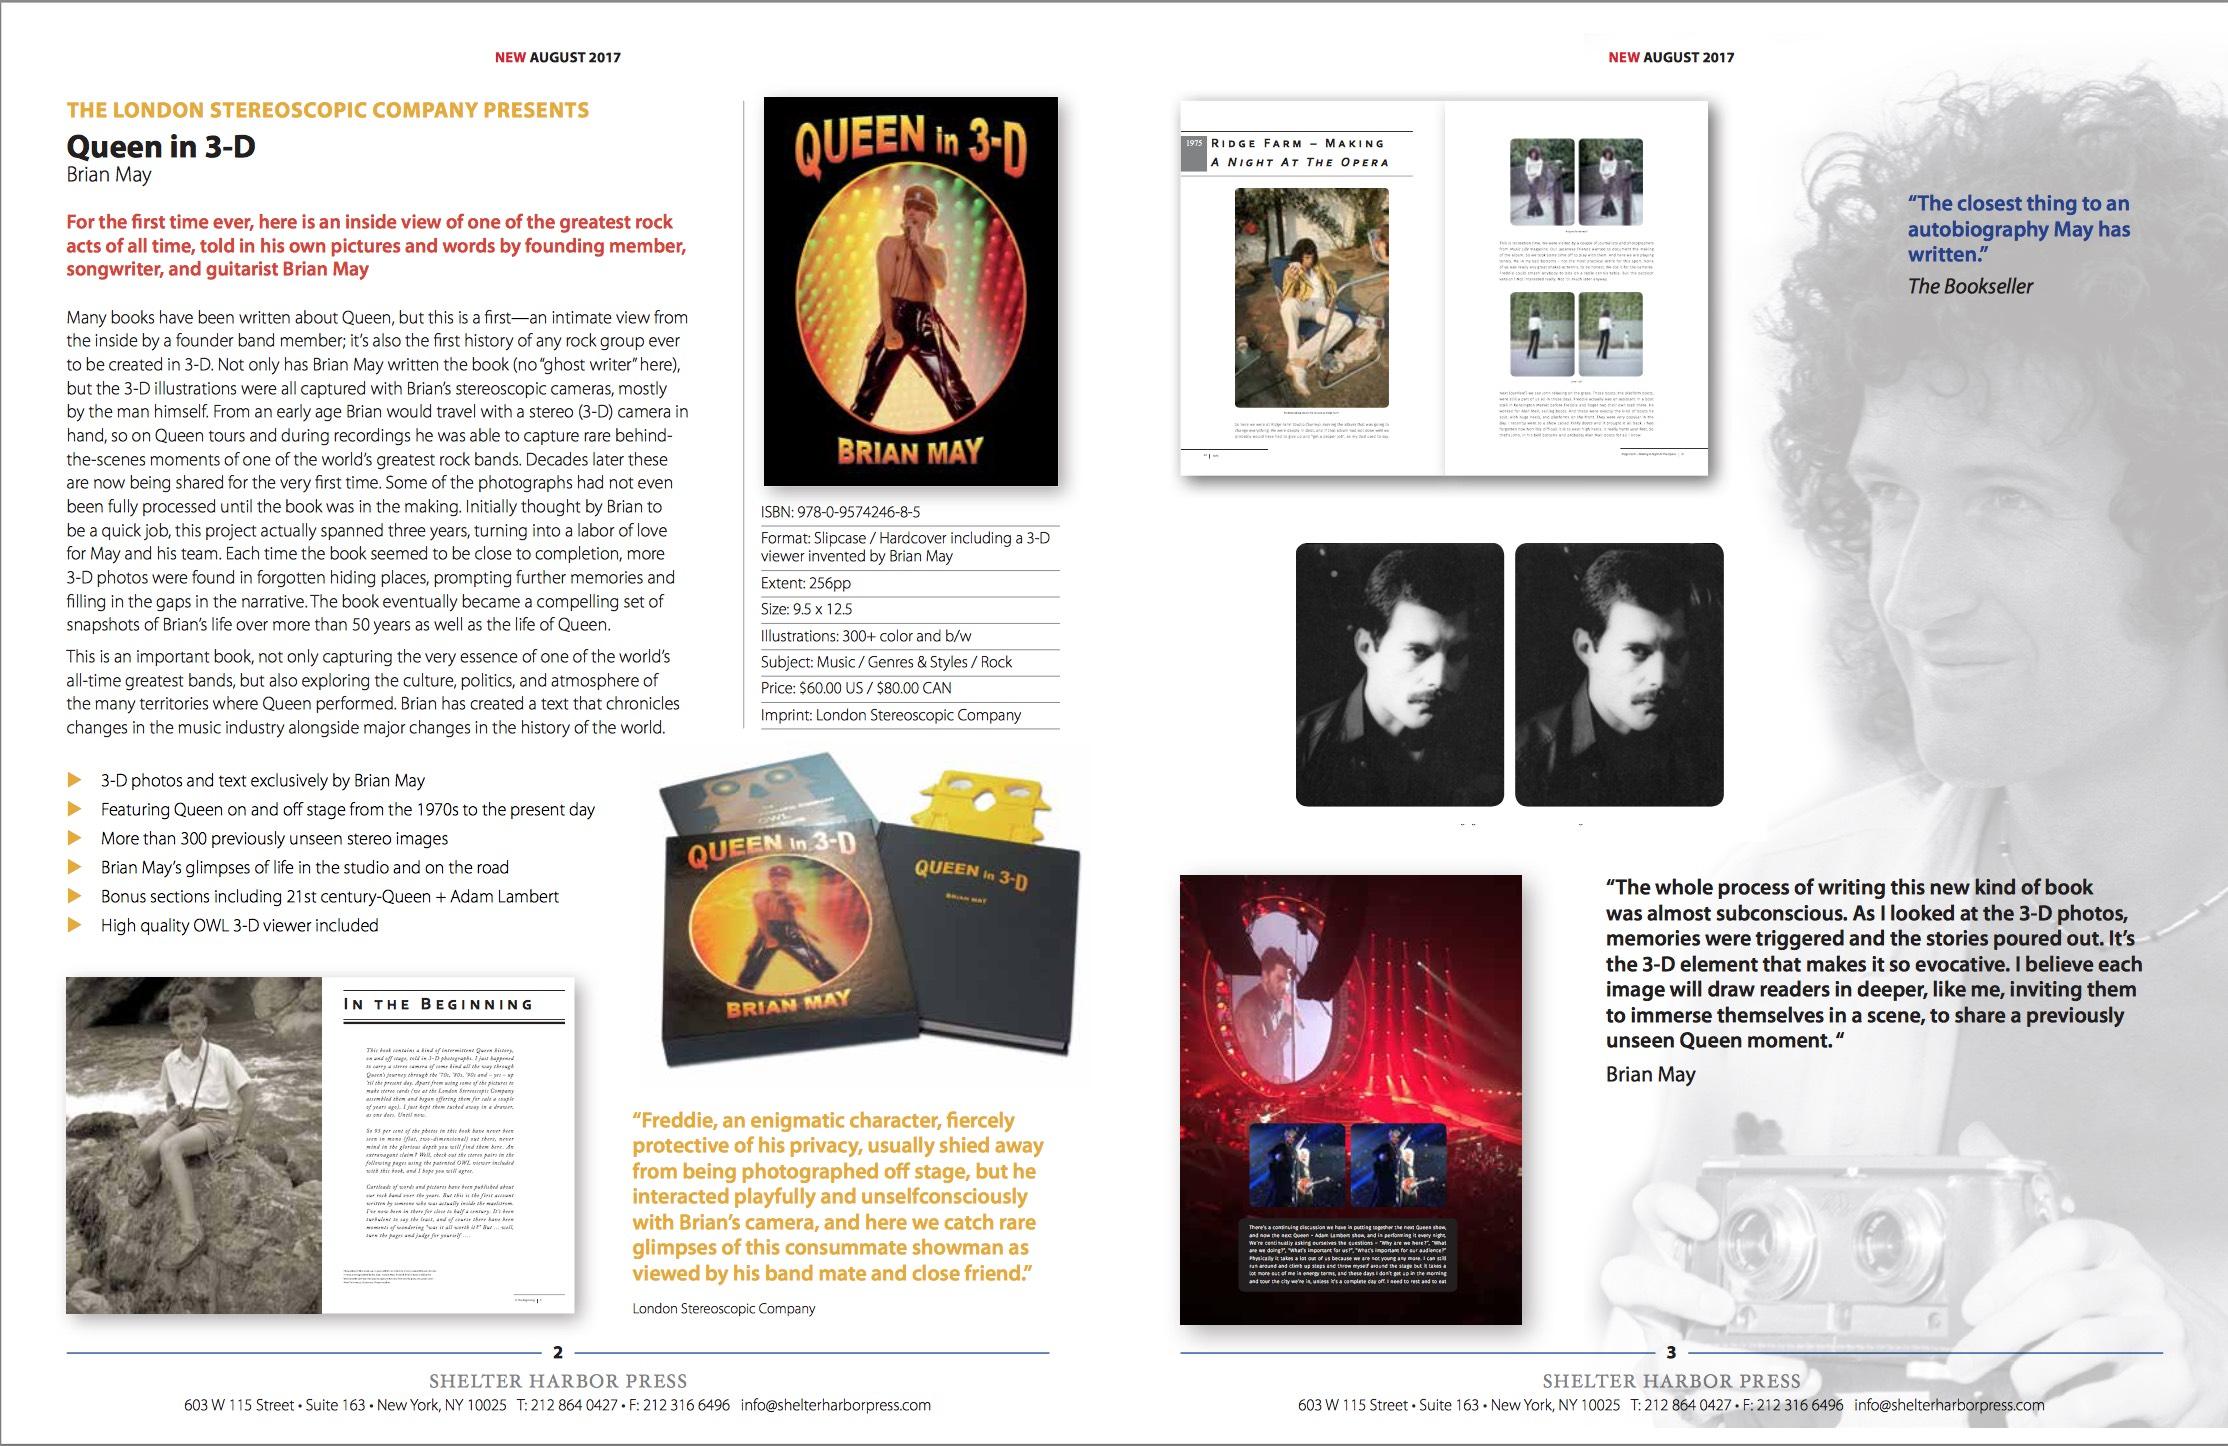 Shelter Harbor Press brochure p2-3